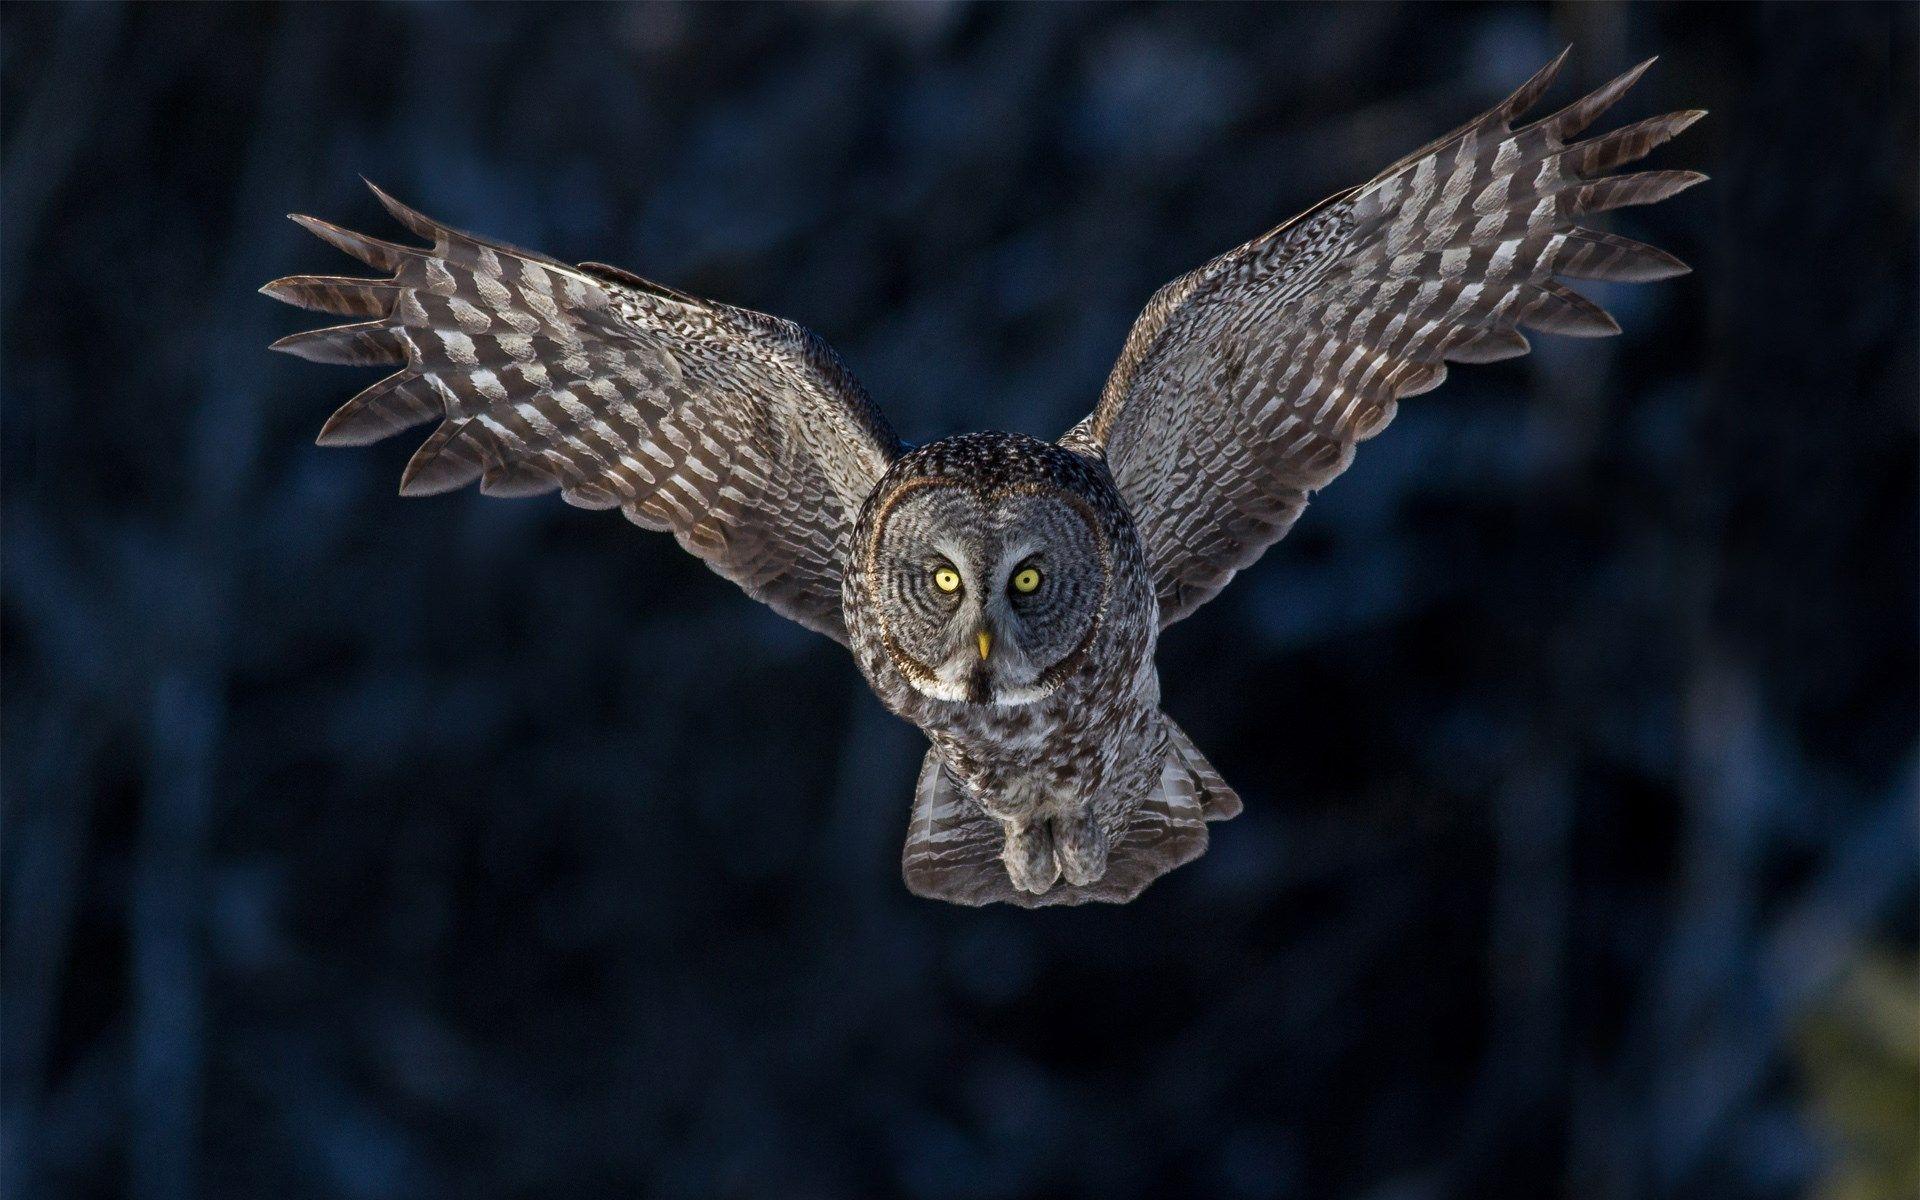 Bird Owl Flying Wings Hd Wallpaper Jpg 1920 1200 Owl Wallpaper Beautiful Owl Bird